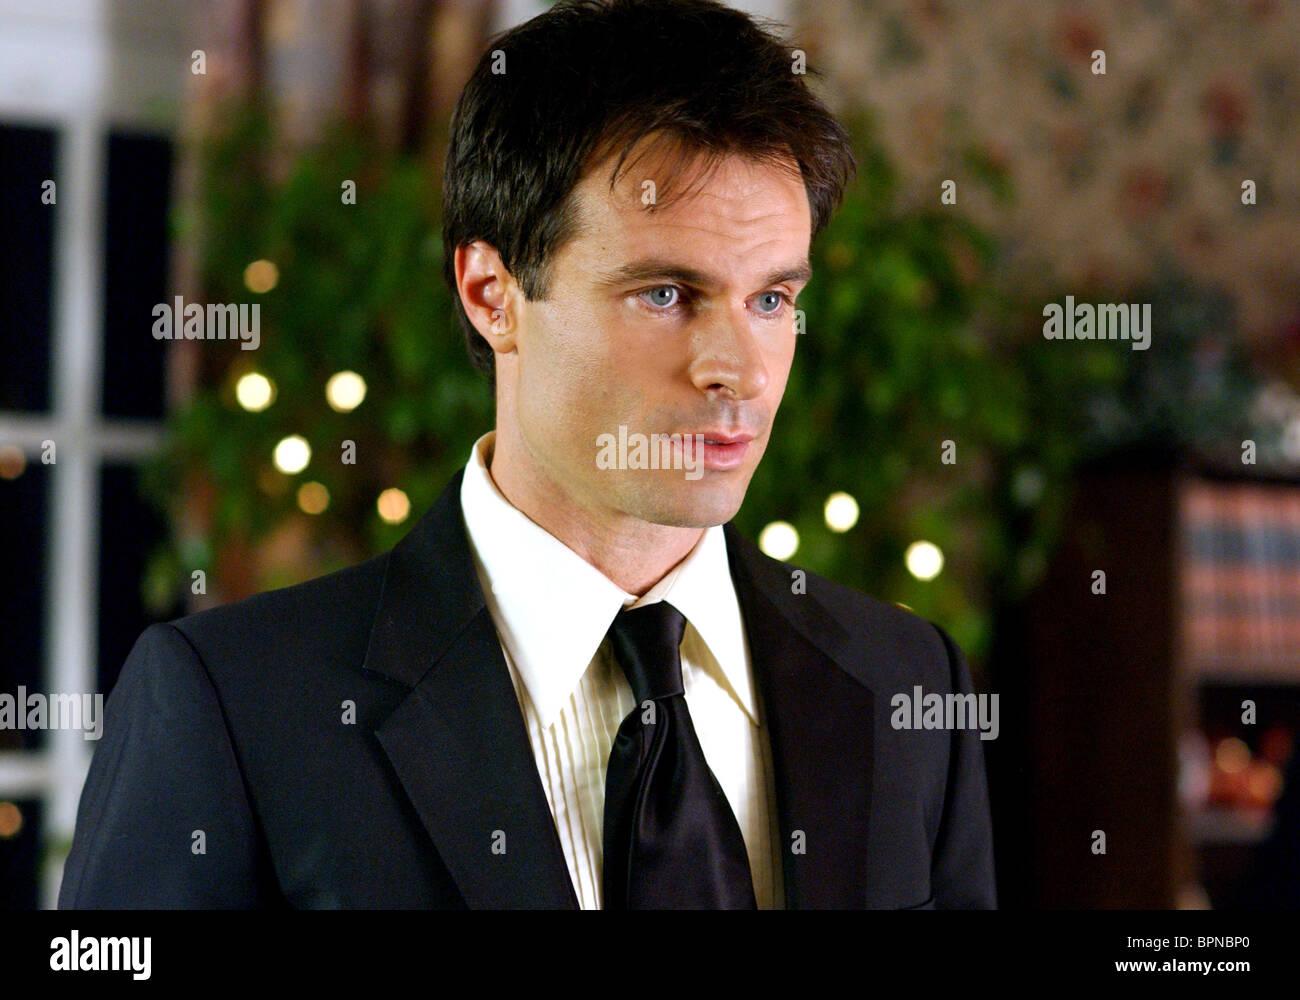 A Boyfriend For Christmas.Patrick Muldoon A Boyfriend For Christmas 2004 Stock Photo